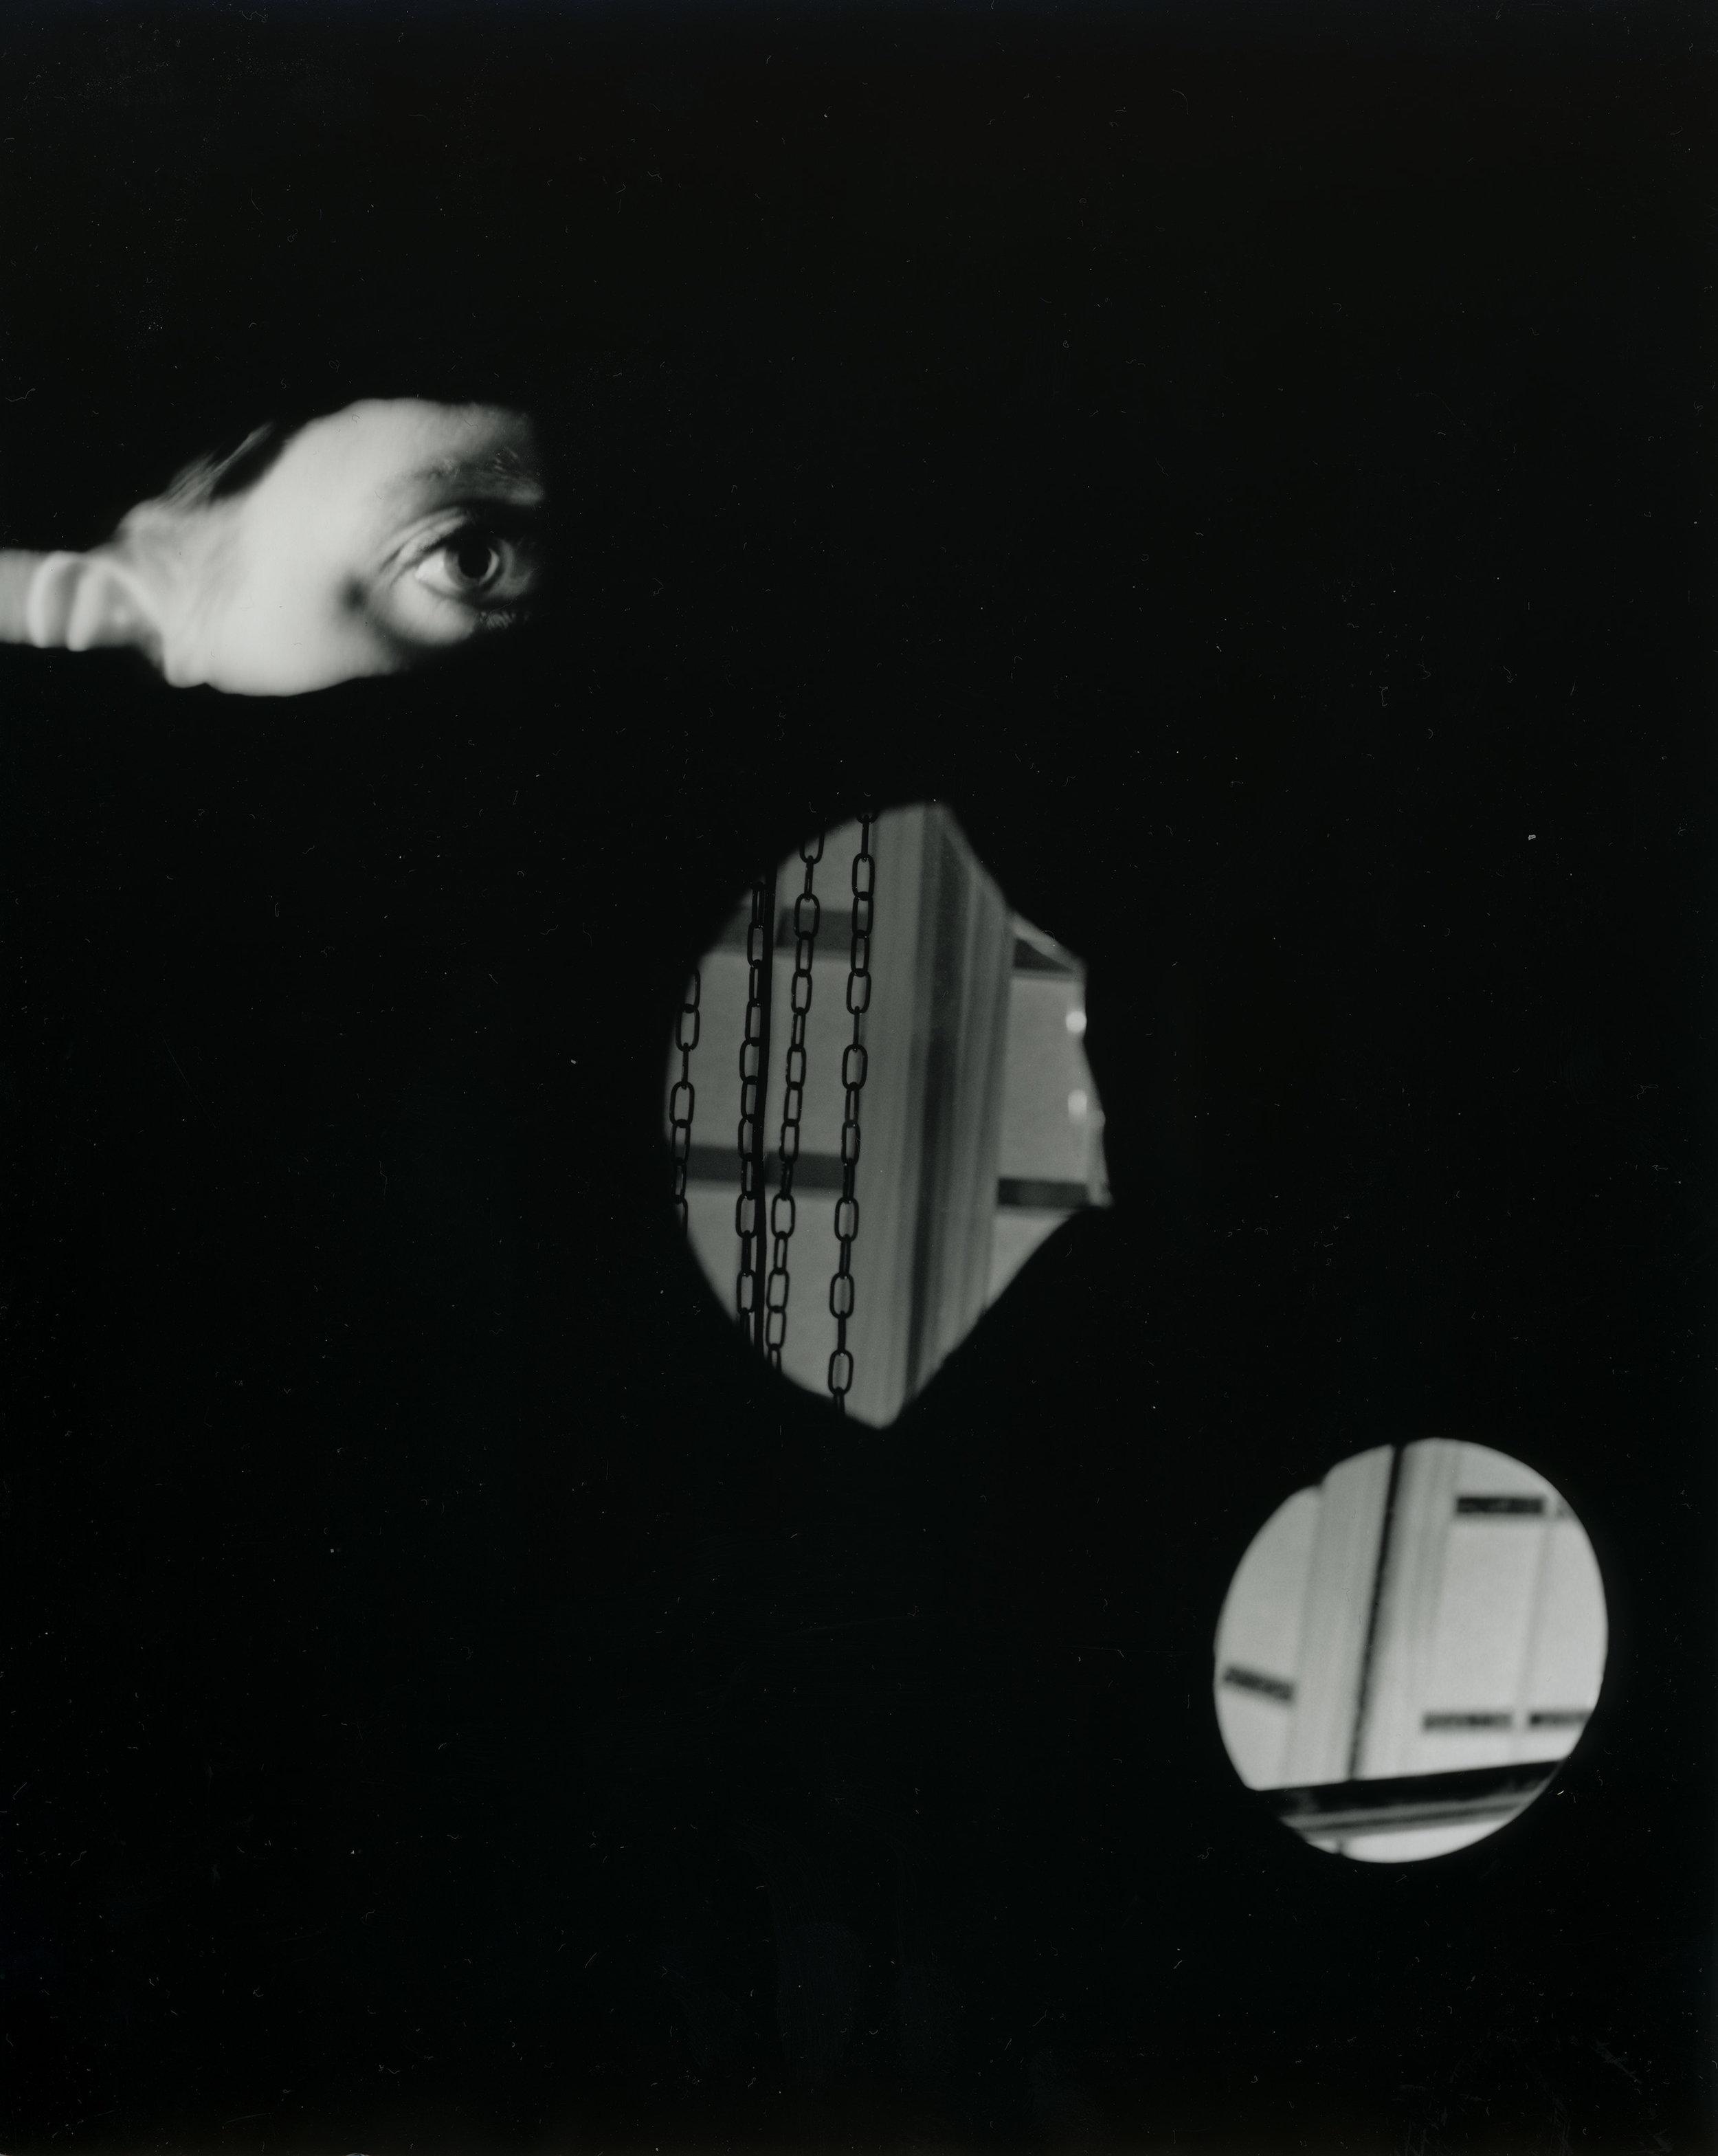 Eye/Mirror, 2016